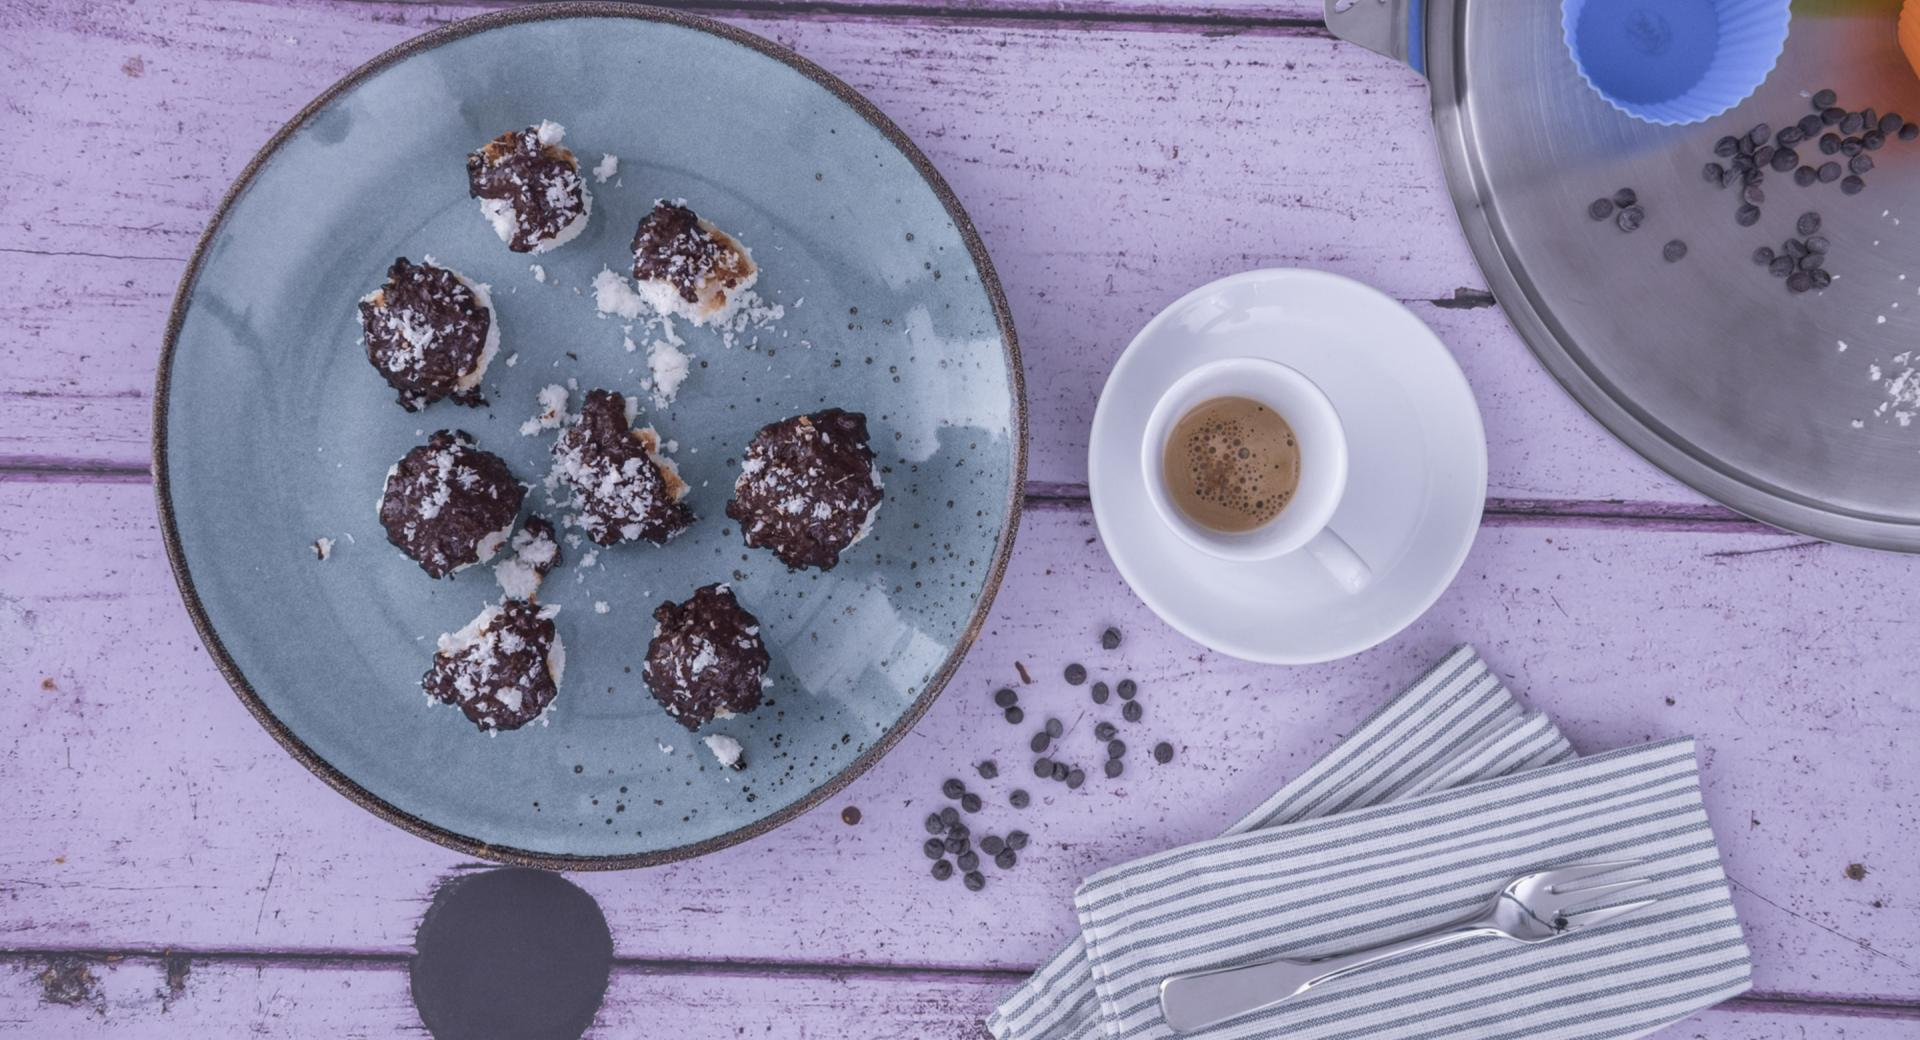 Bolitas de coco con chocolate